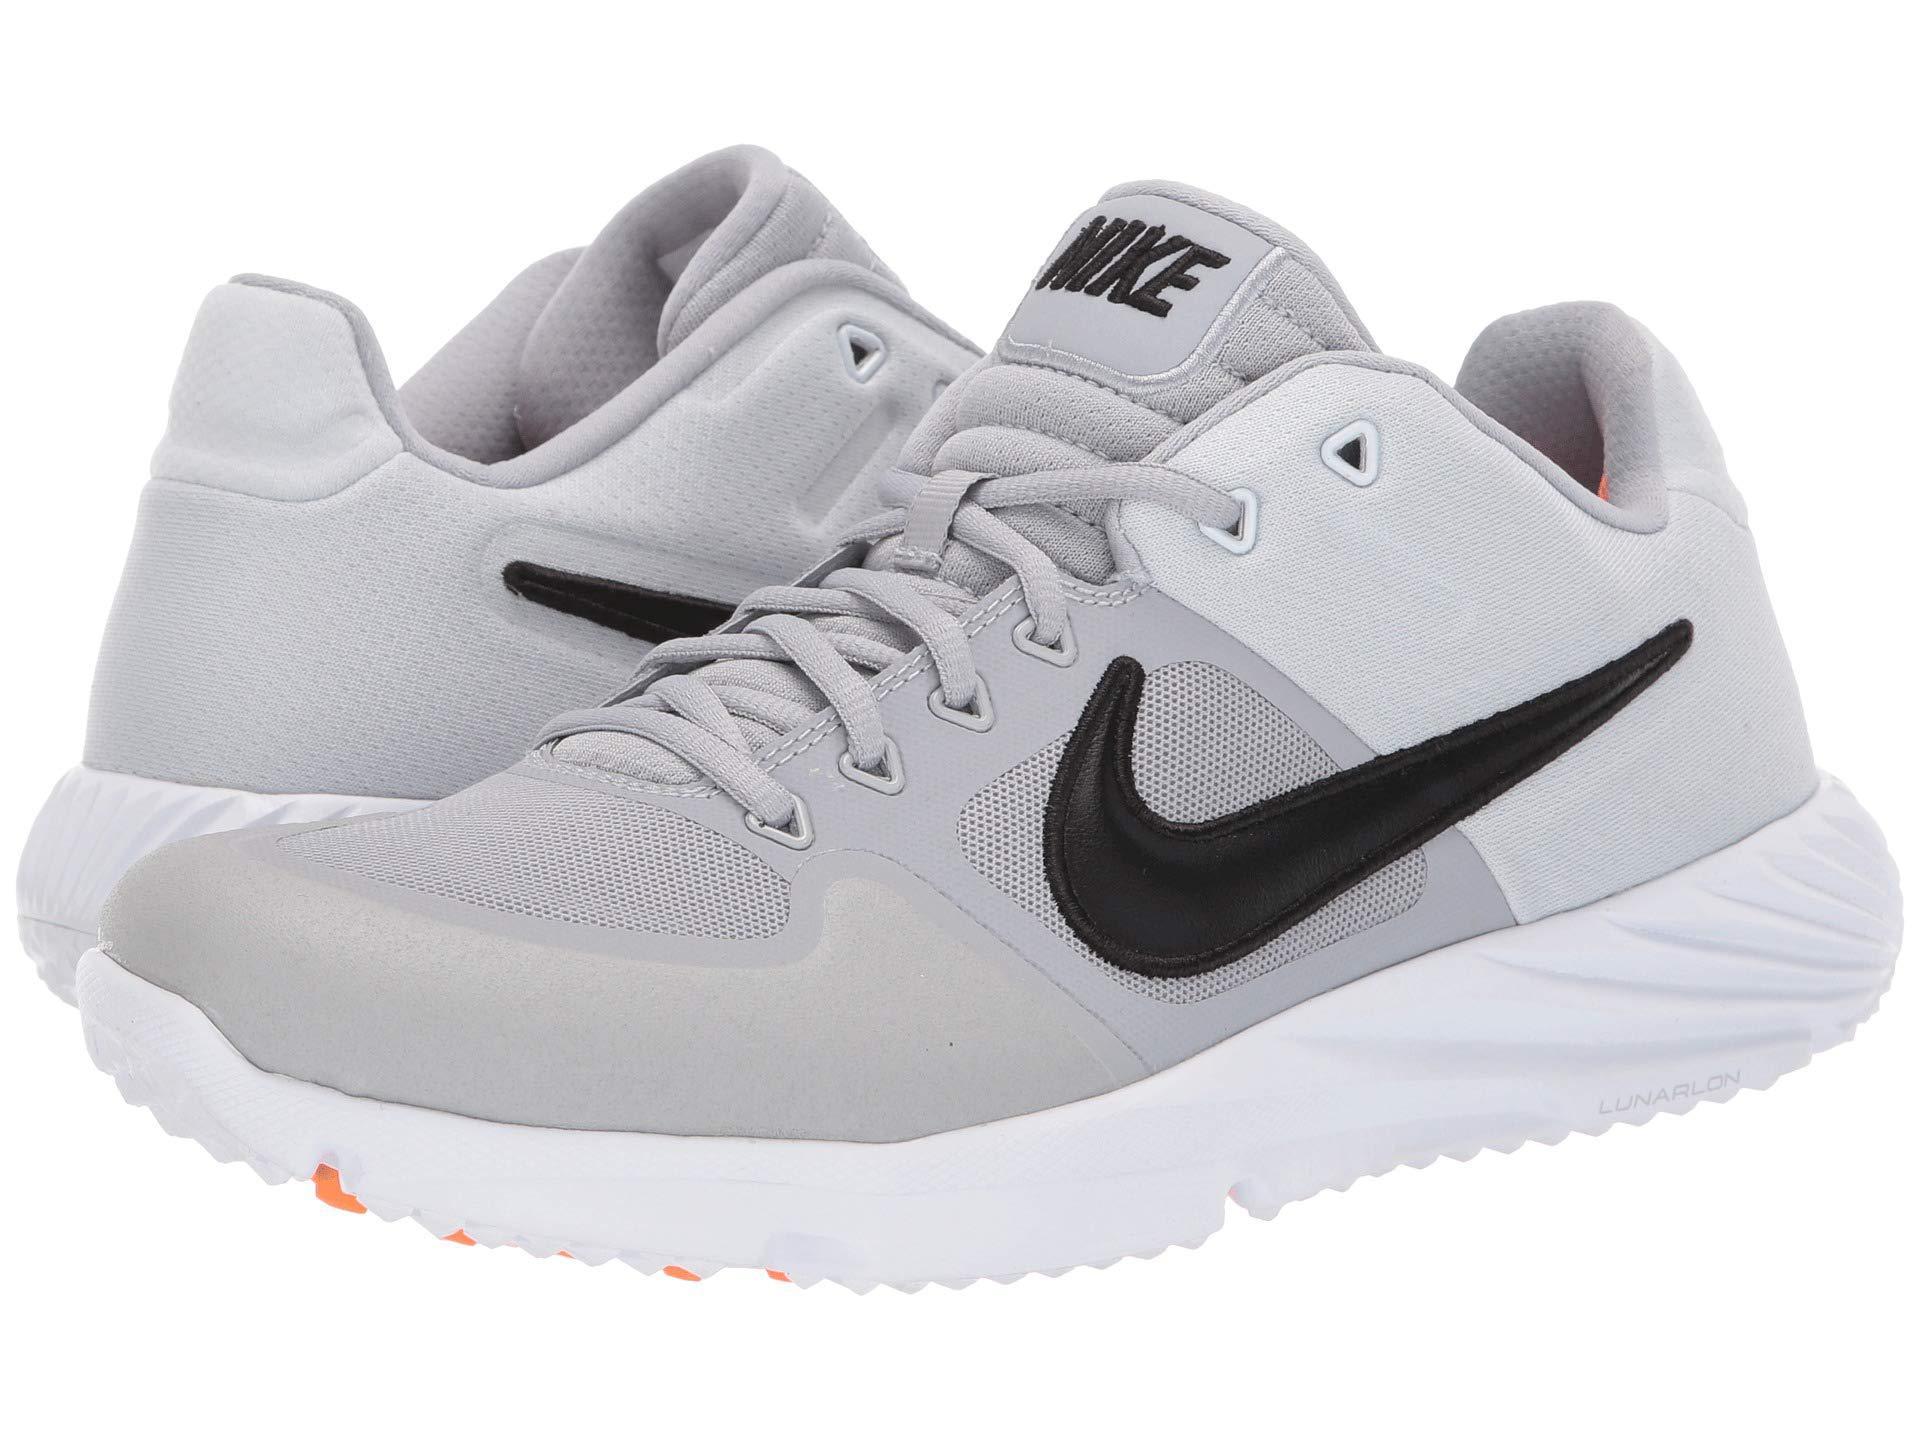 3c437b9829e7 Lyst - Nike Alpha Huarache Elite 2 Turf (game Royal white gym Blue ...